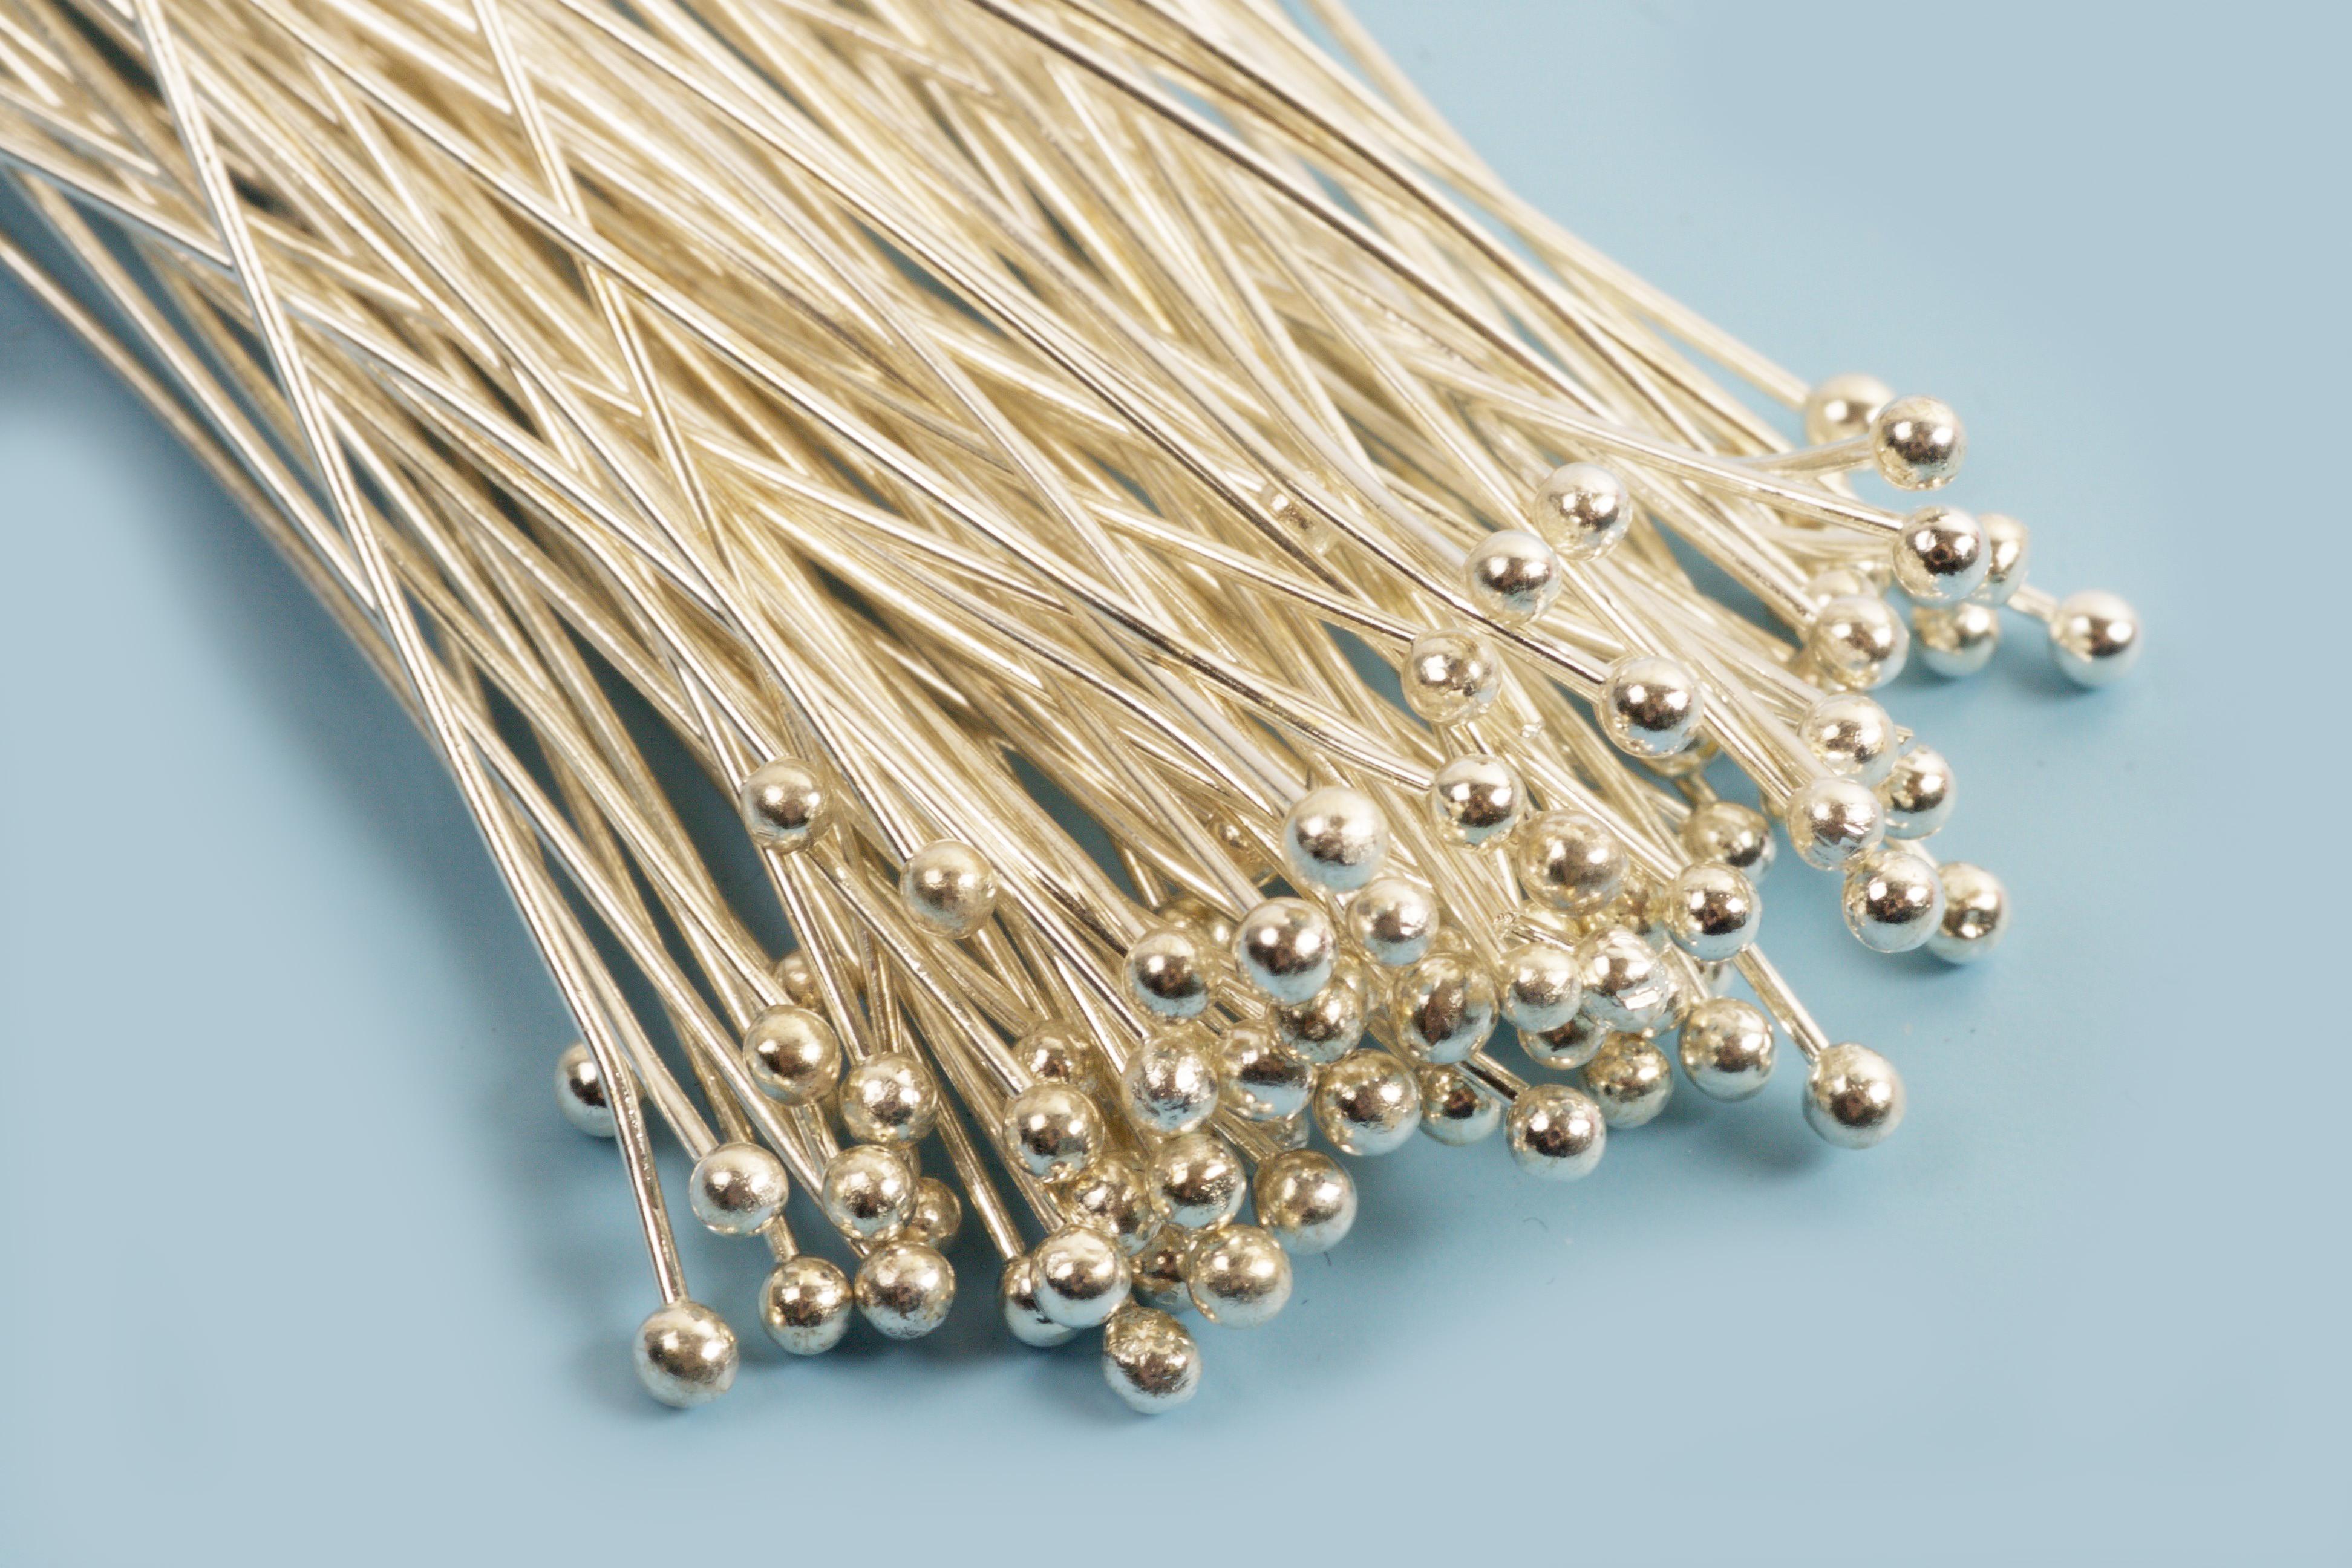 Perlestave m/1 perle, 50x0,6 mm, FS, 100 stk.